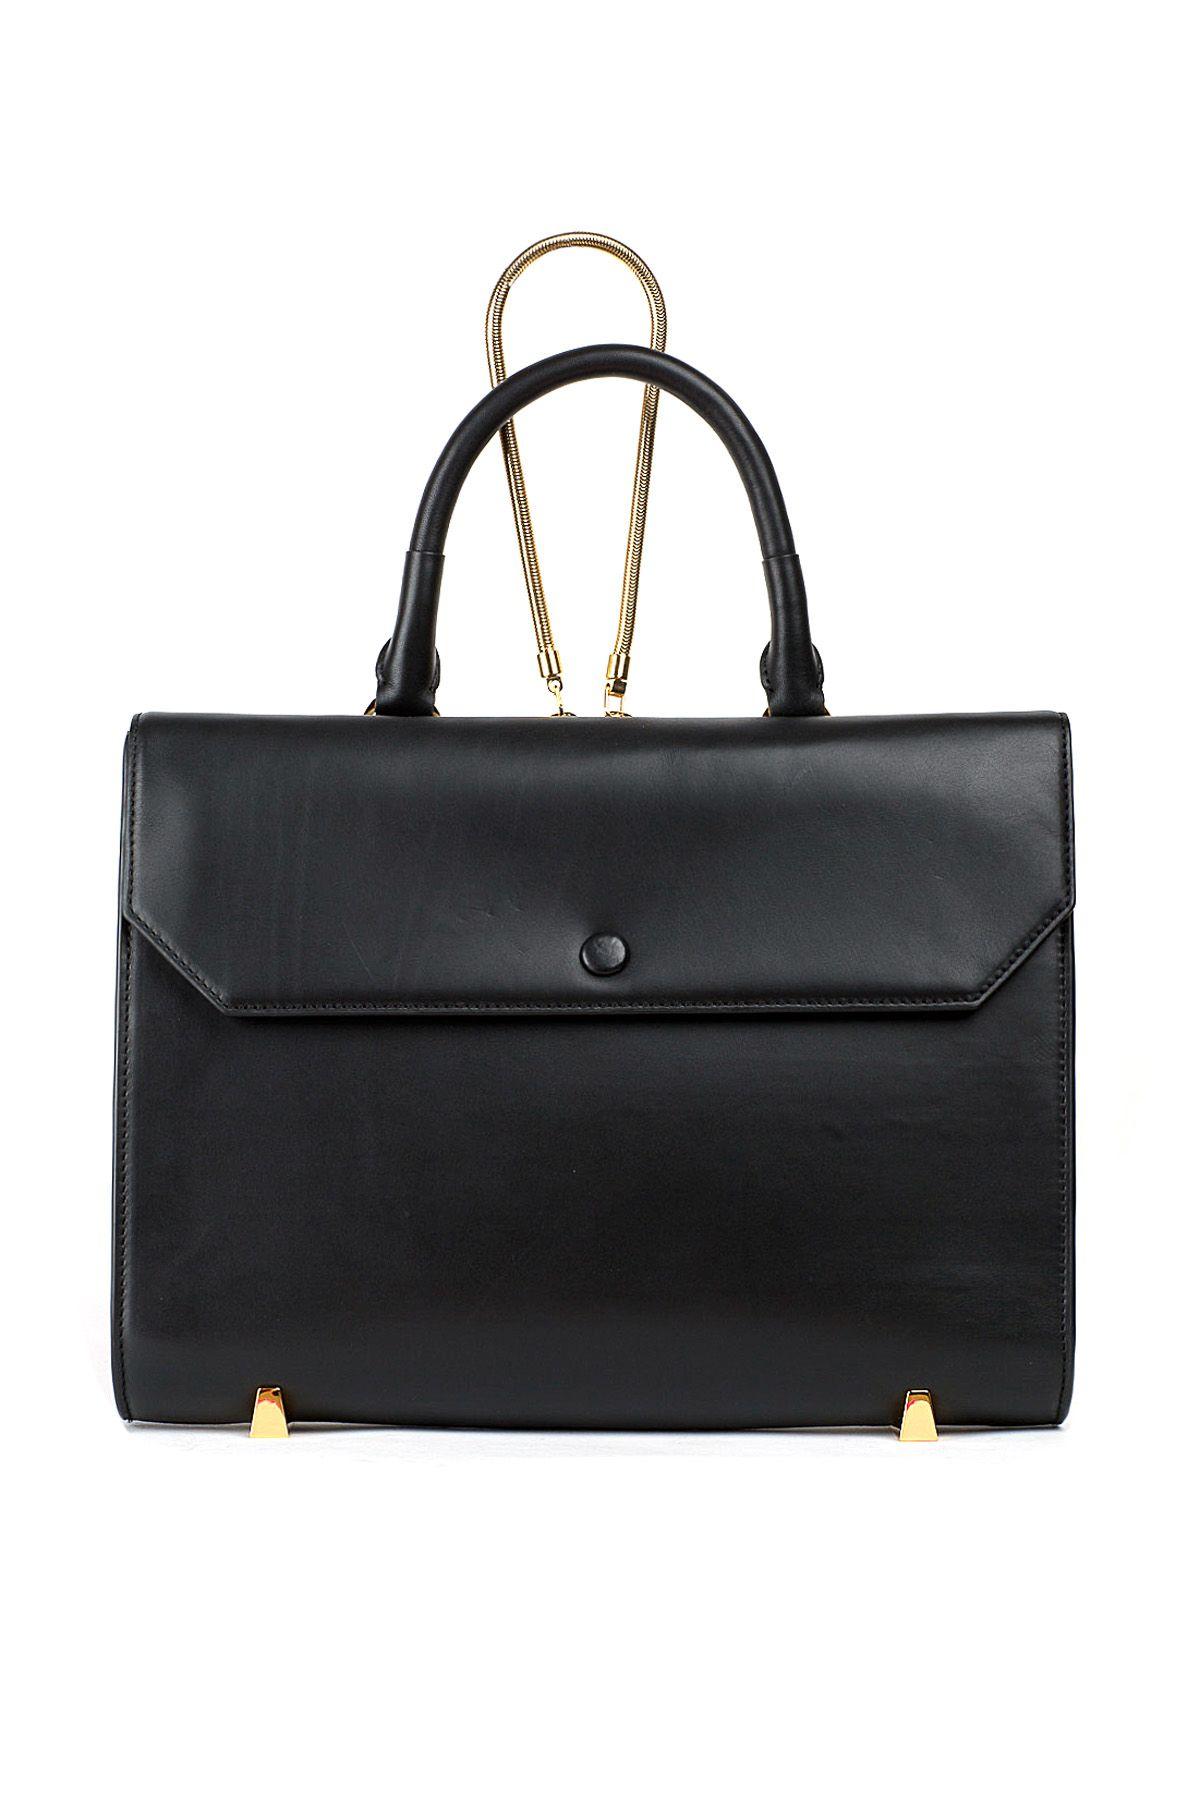 e08275fa38139 Alexander Wang Chastity French Bull Sling Bag